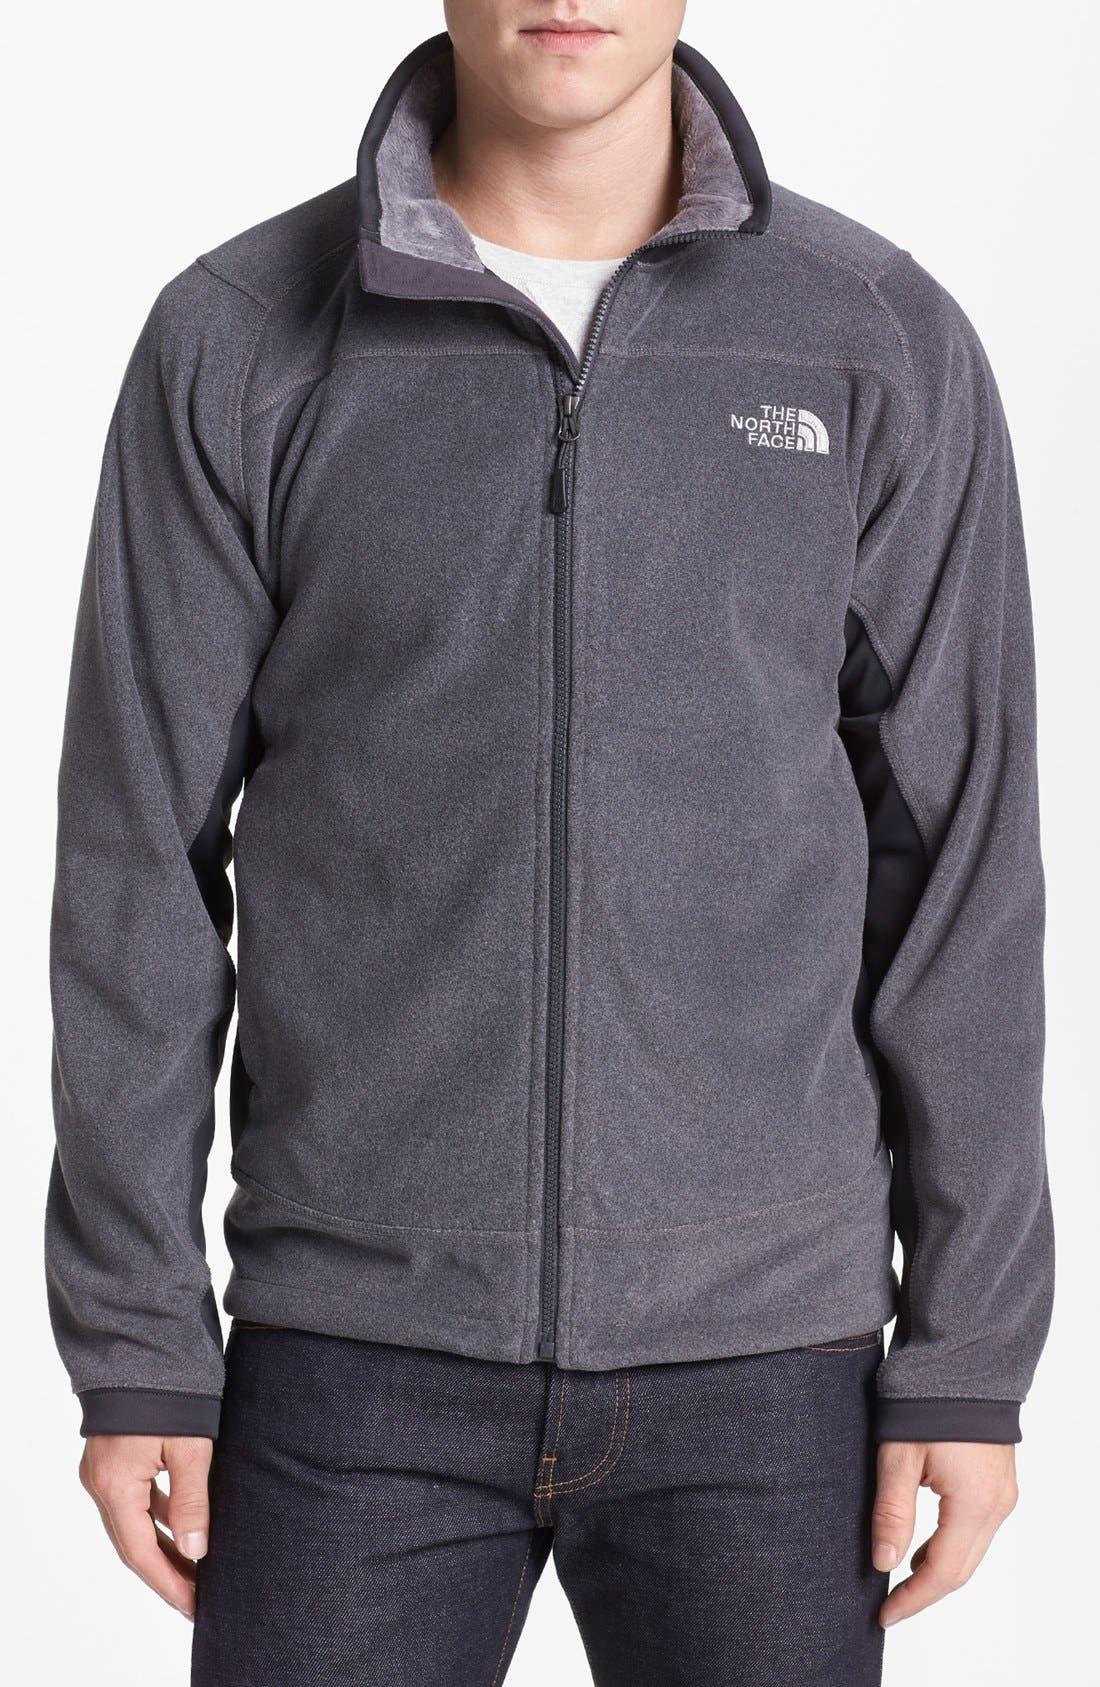 Alternate Image 1 Selected - The North Face 'Valence' FlashDry™ Fleece Jacket